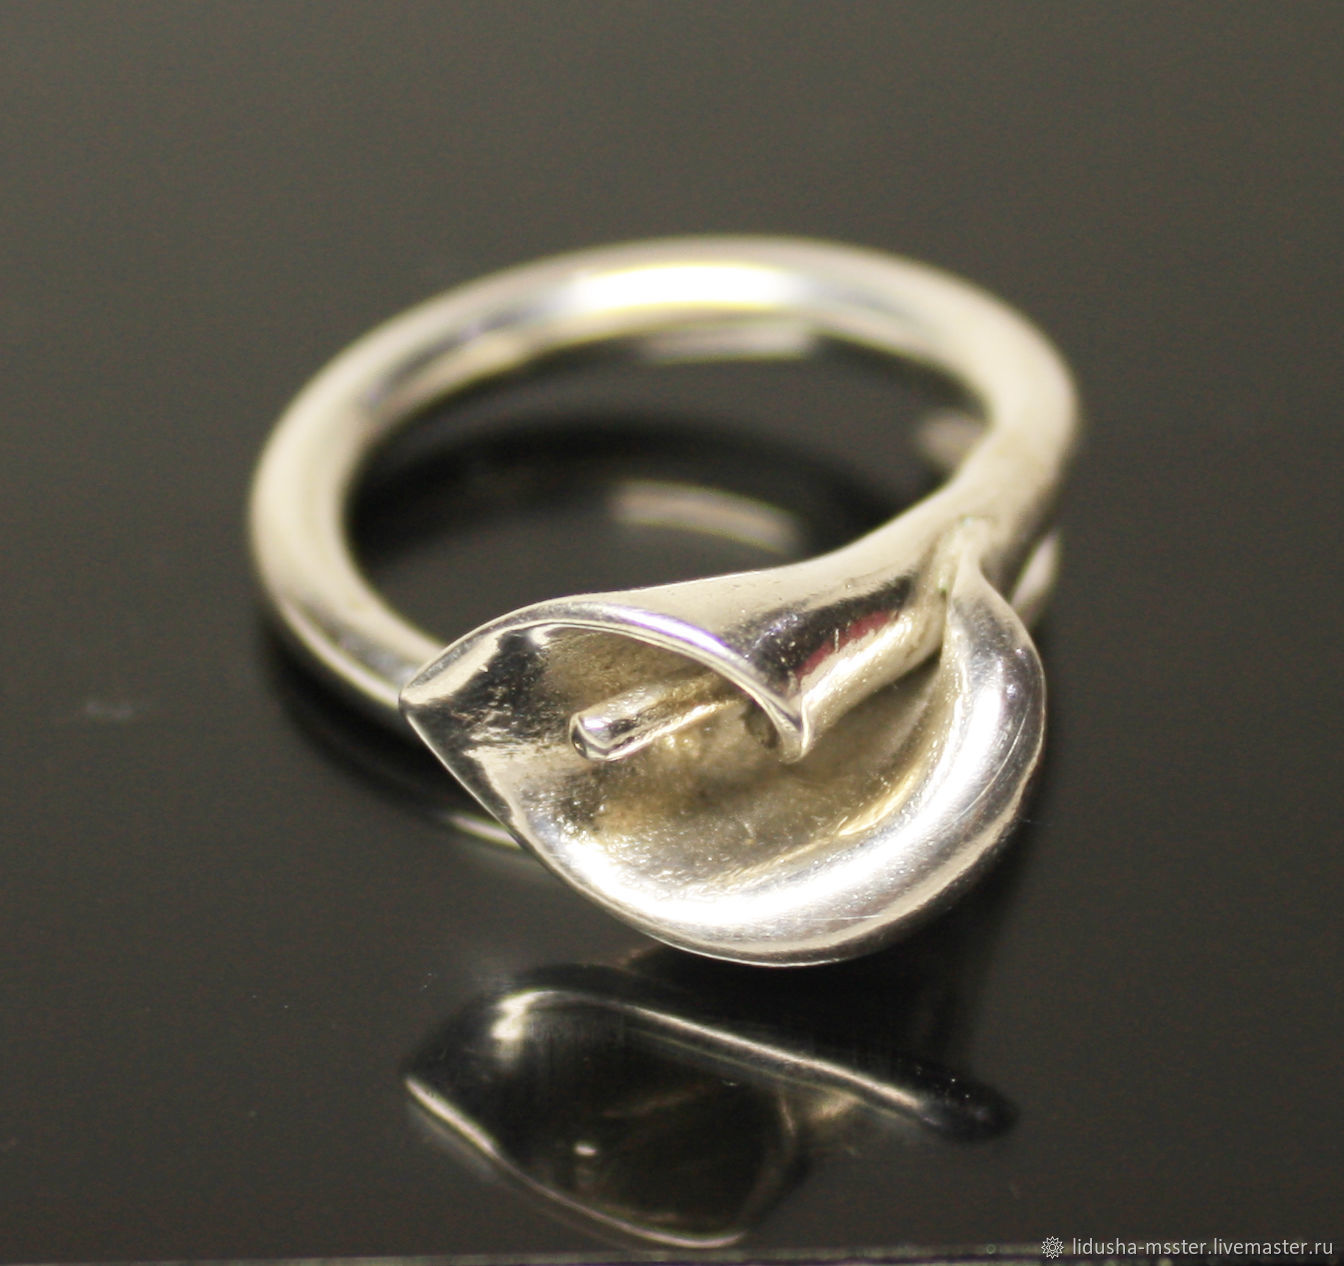 Ring 'Calla', Rings, Nizhny Novgorod,  Фото №1